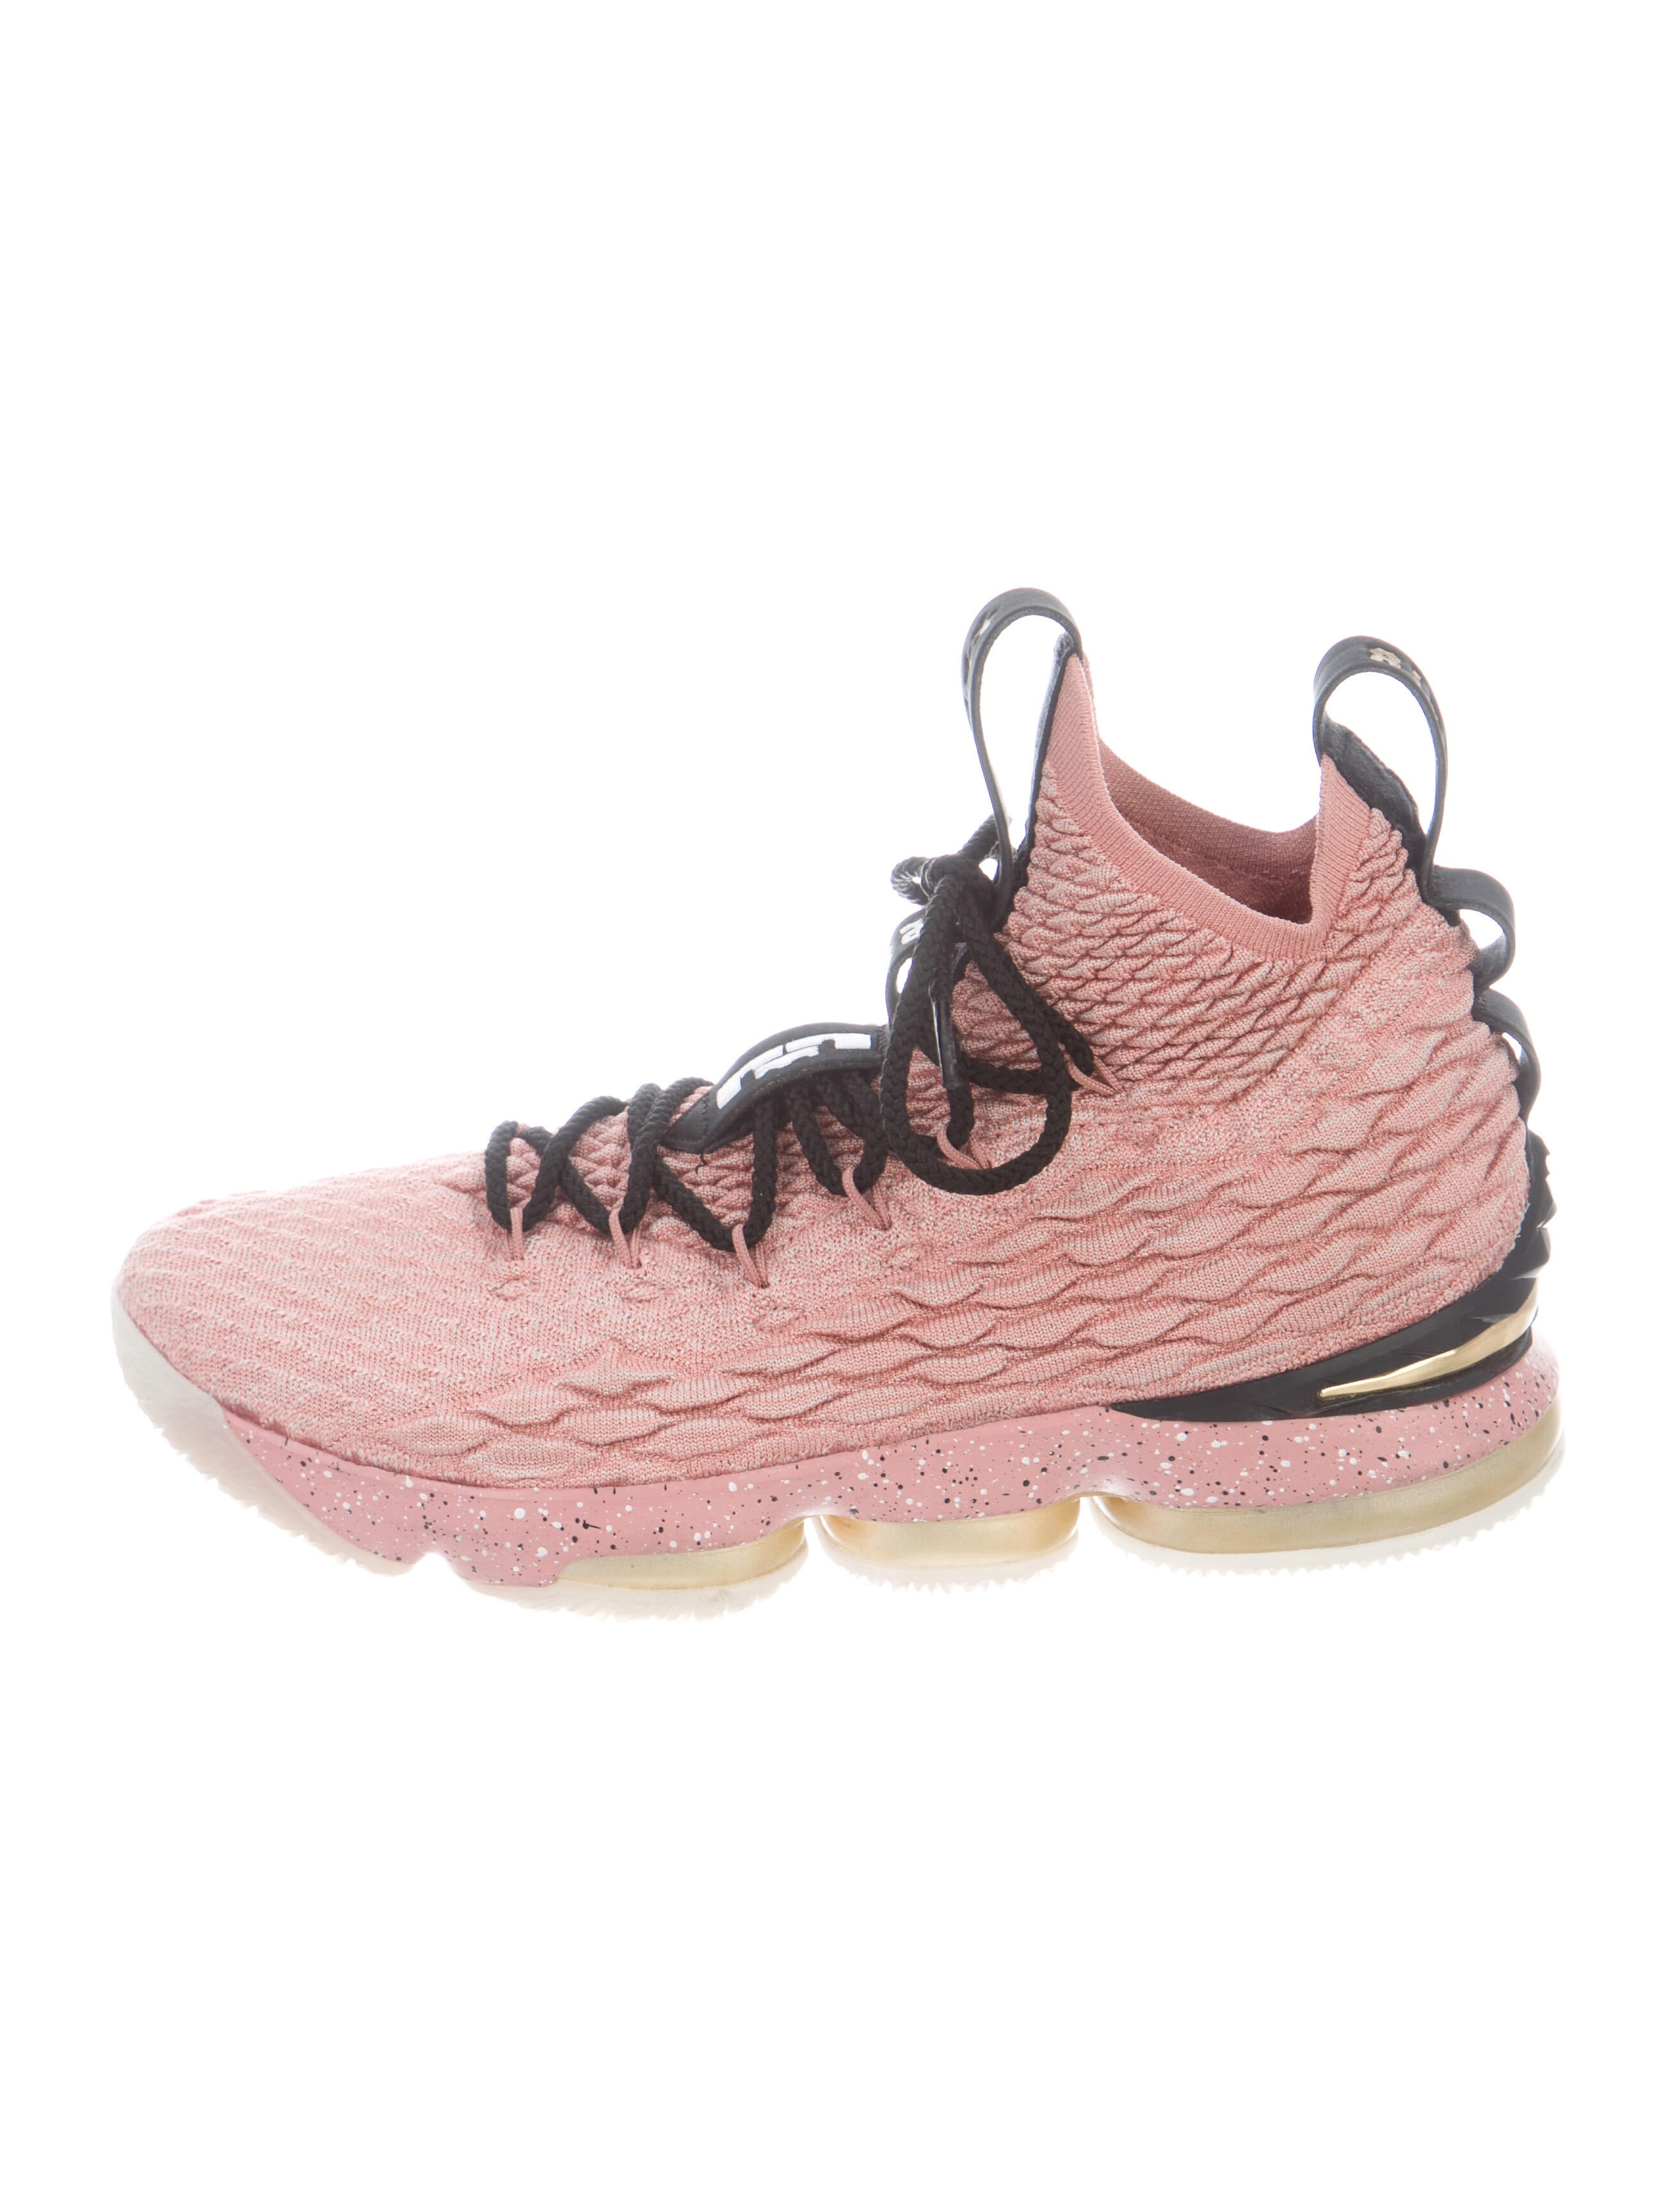 Nike LeBron 15 'Rust Pink' Sneakers